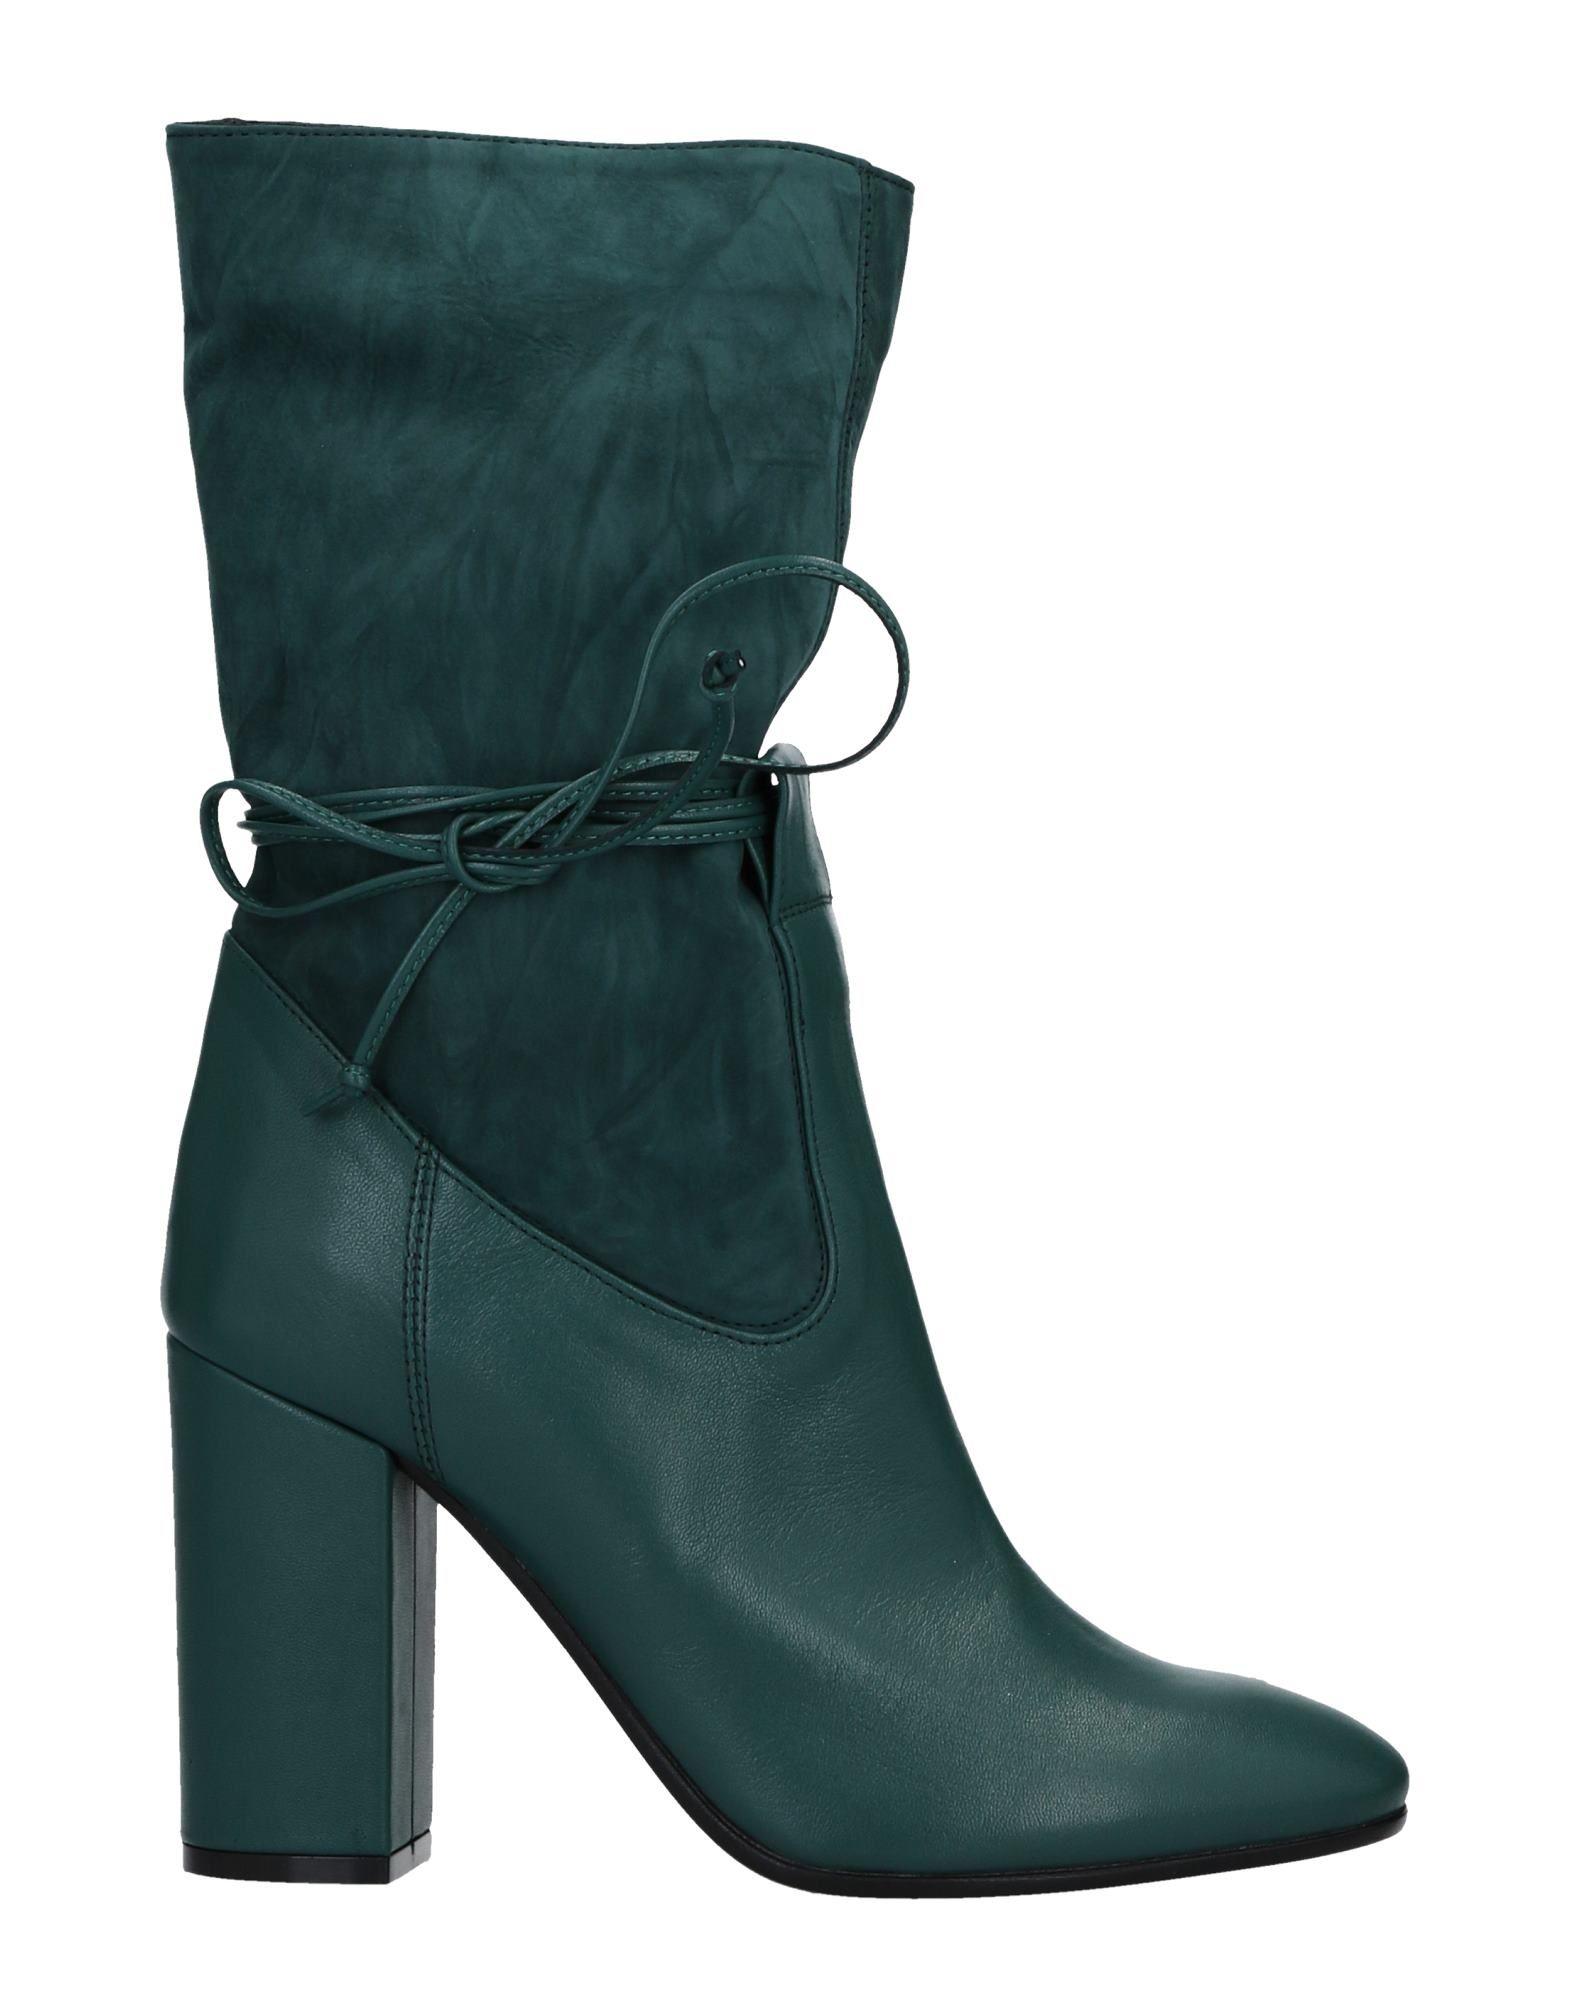 FIORIFRANCESI Ankle Boot in Deep Jade